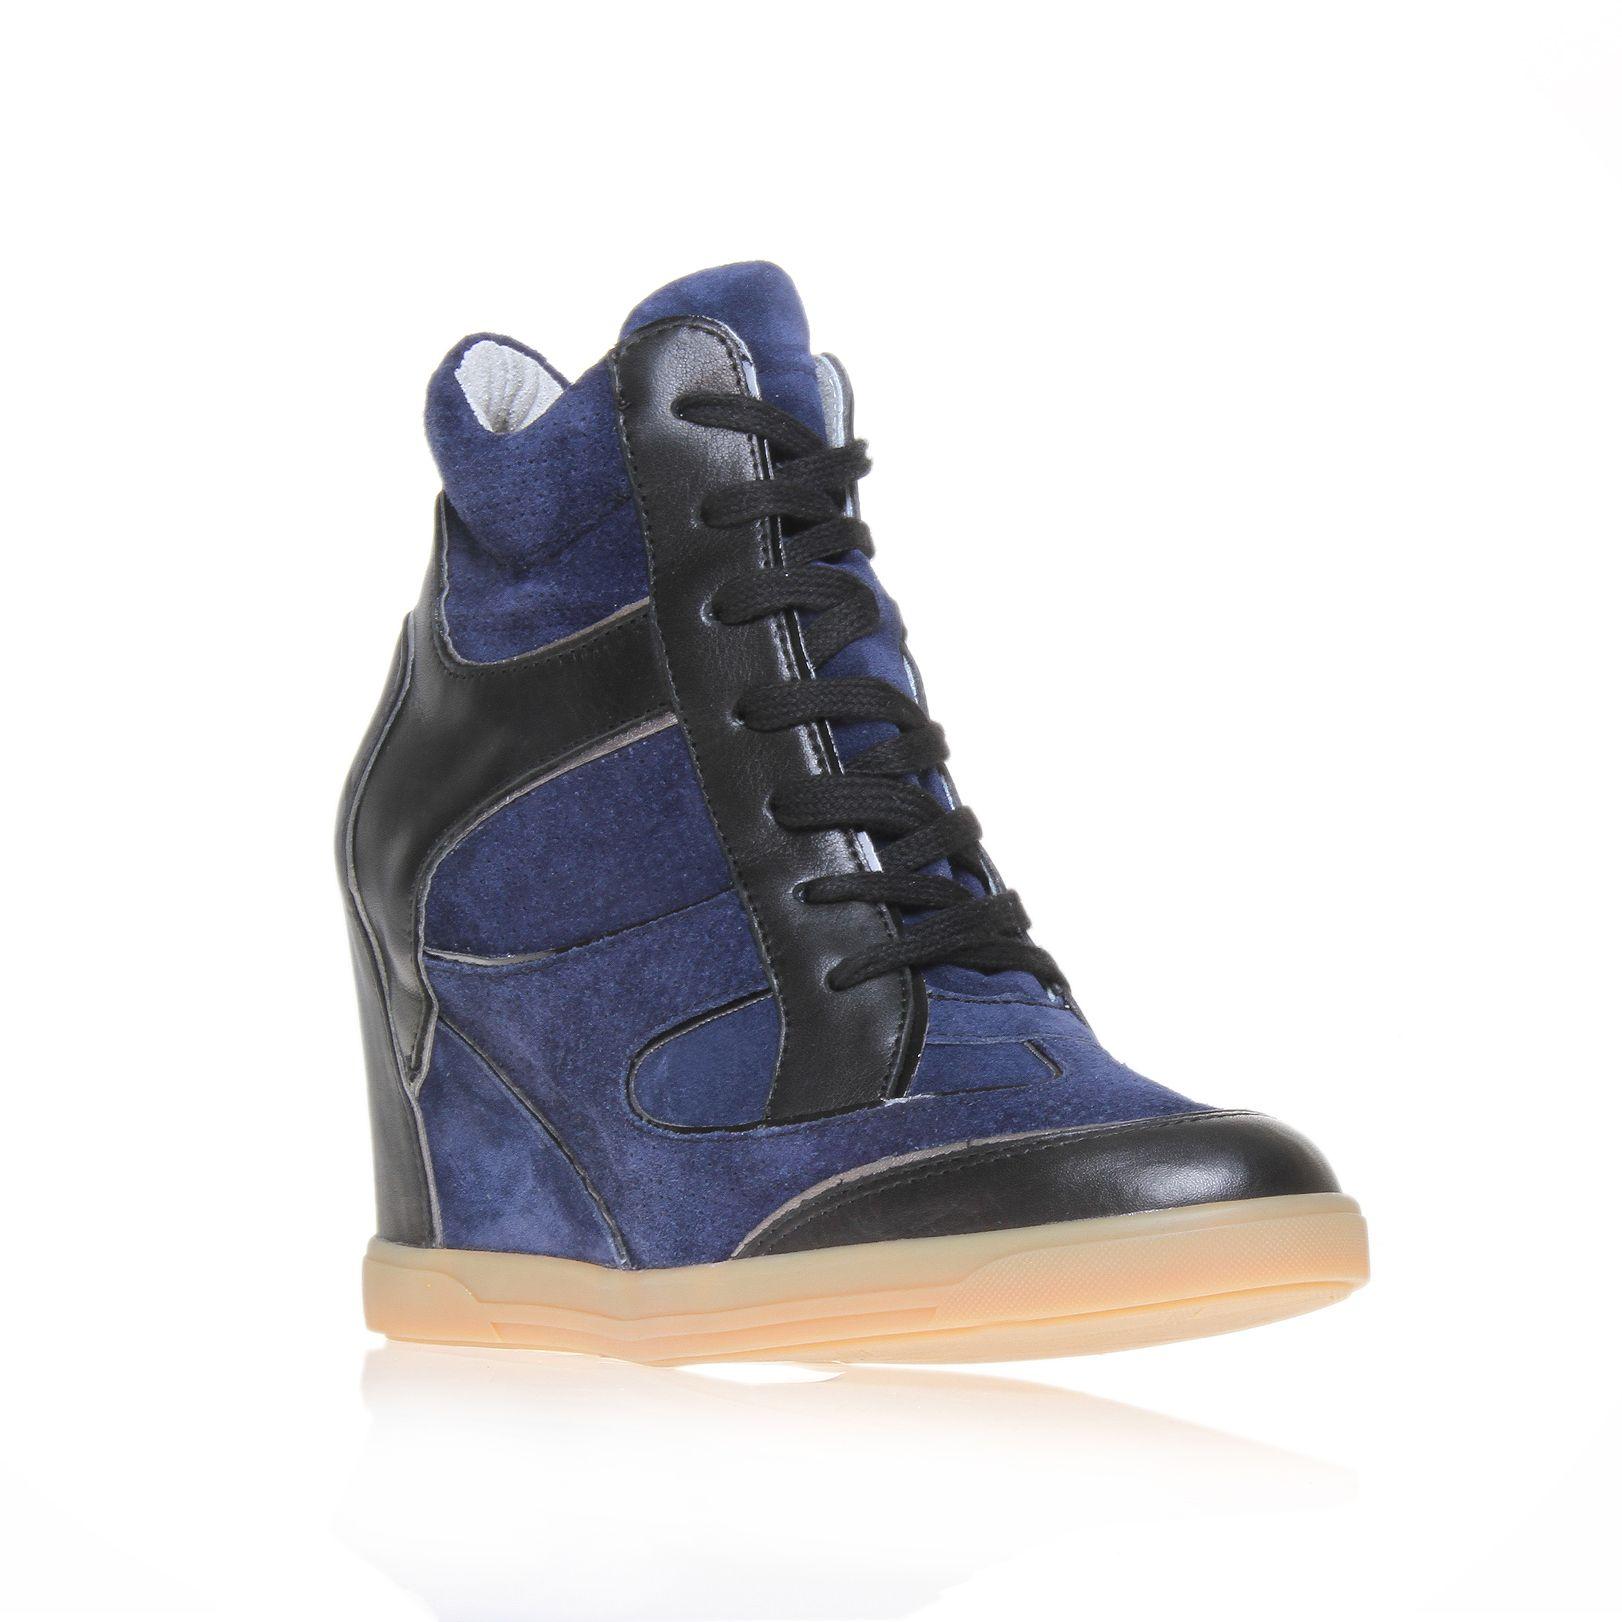 carvela kurt geiger liberty wedge trainer shoes in